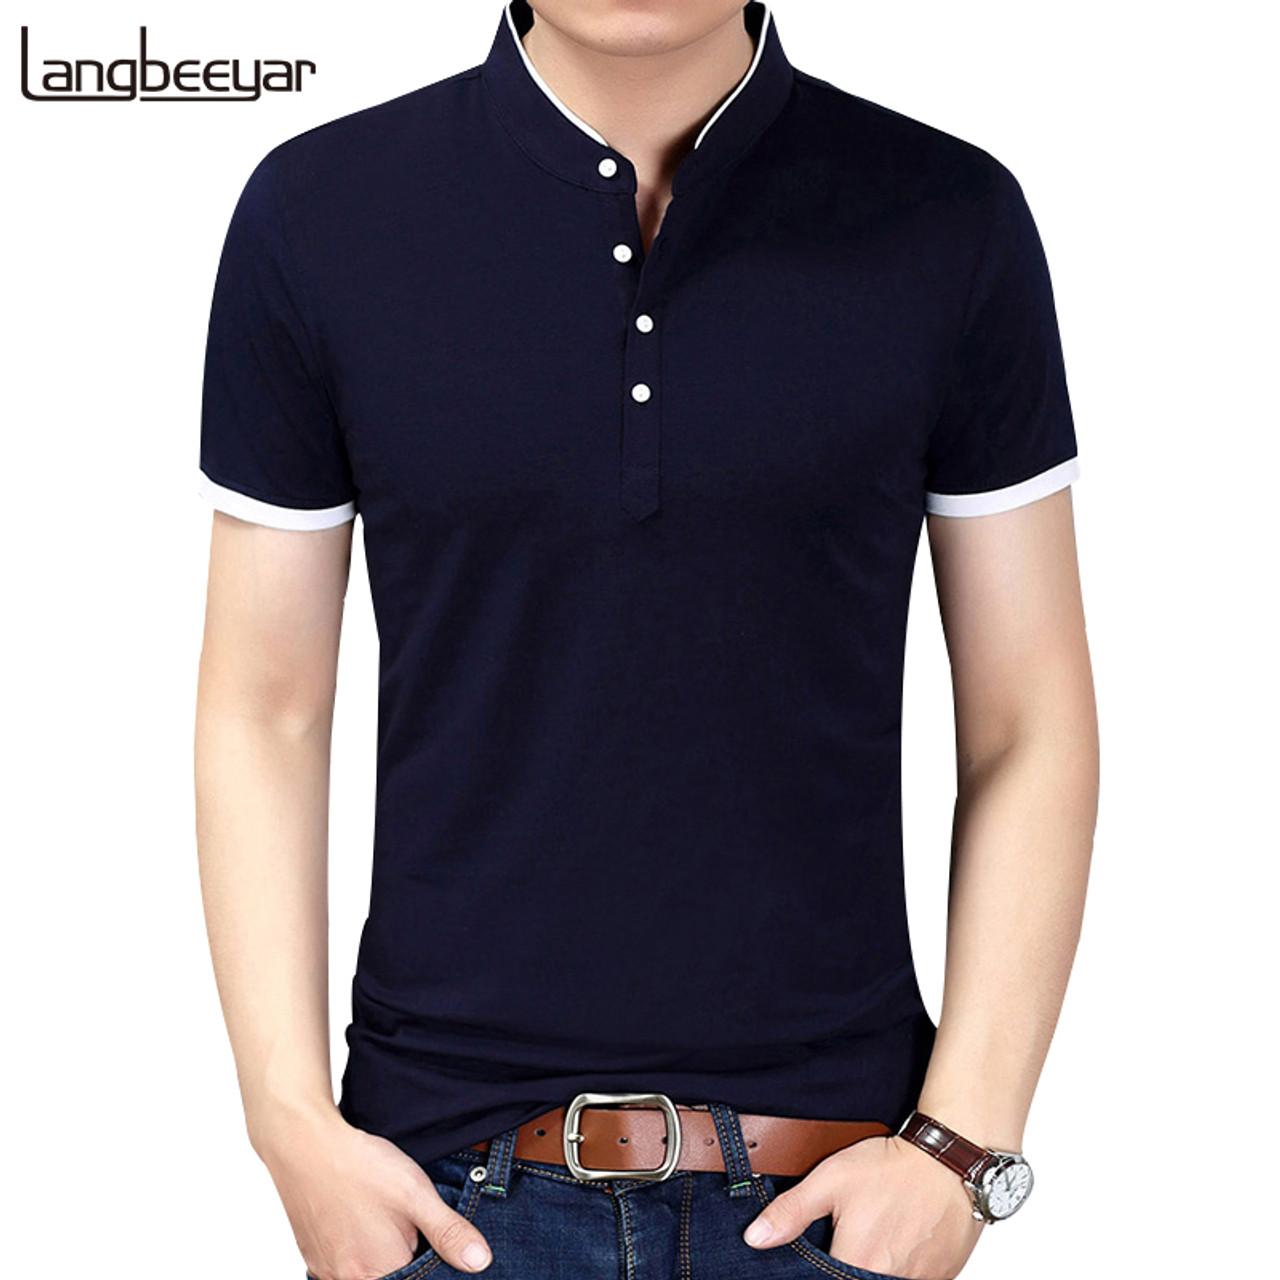 68e65a56b 2018 Summer New Fashion Brand Clothing Tshirt Men Solid Color Slim Fit Short  Sleeve T Shirt ...